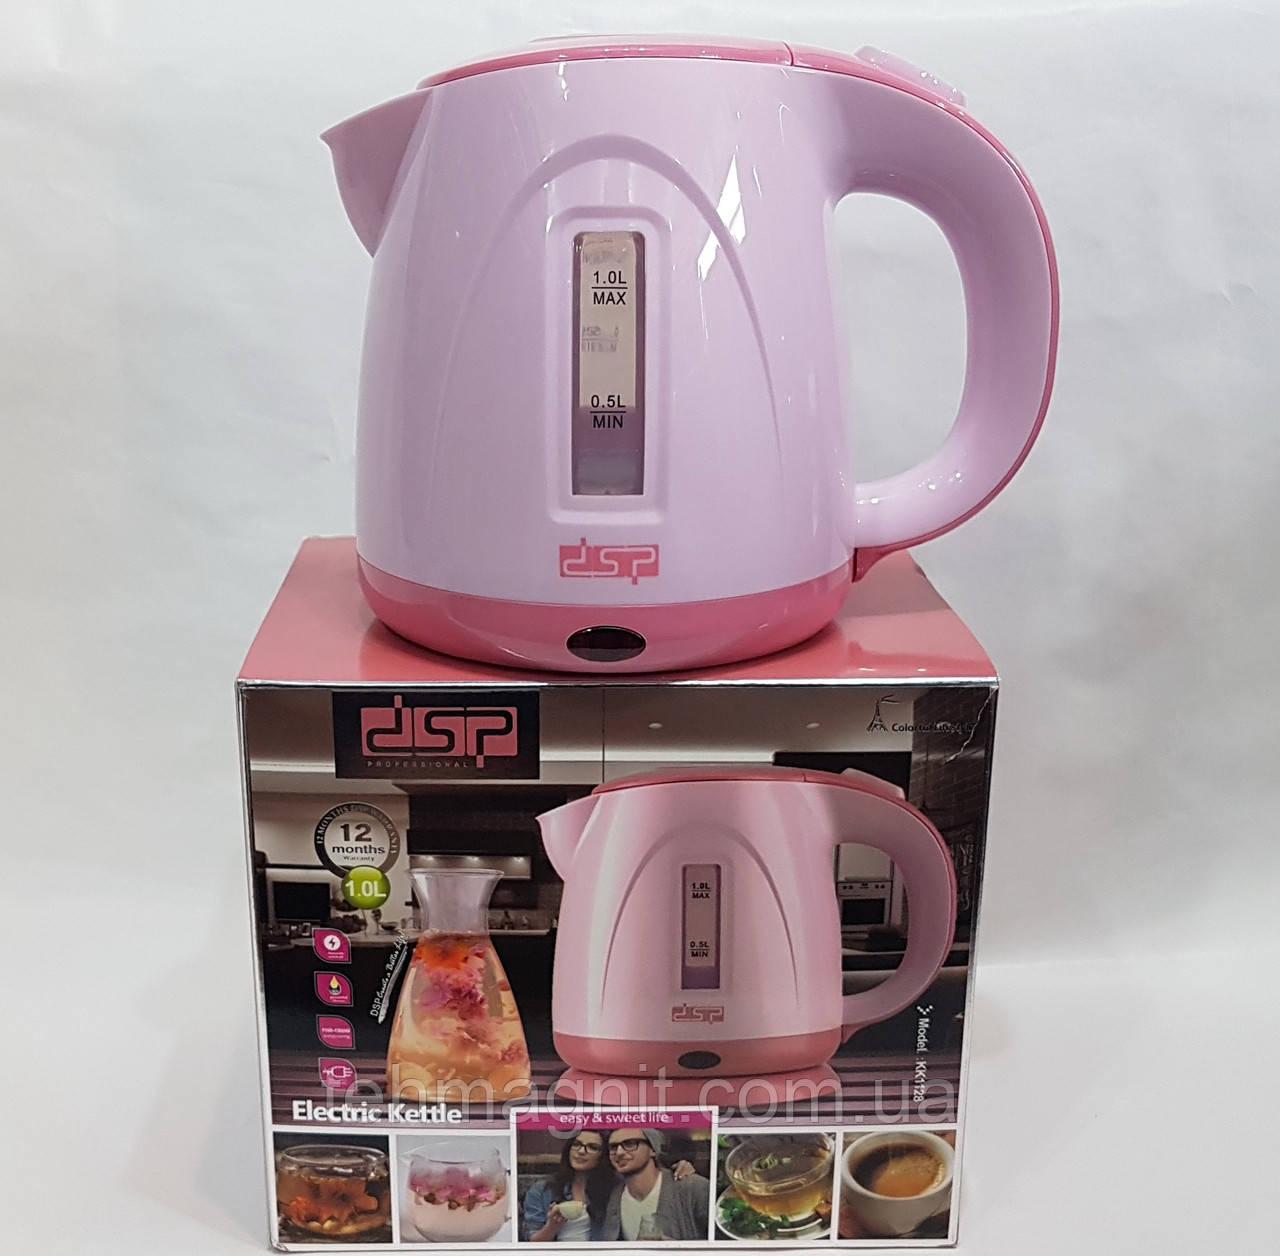 Чайник електричний DSP KK1128 1л ( 1100-1300Вт ) електрочайник